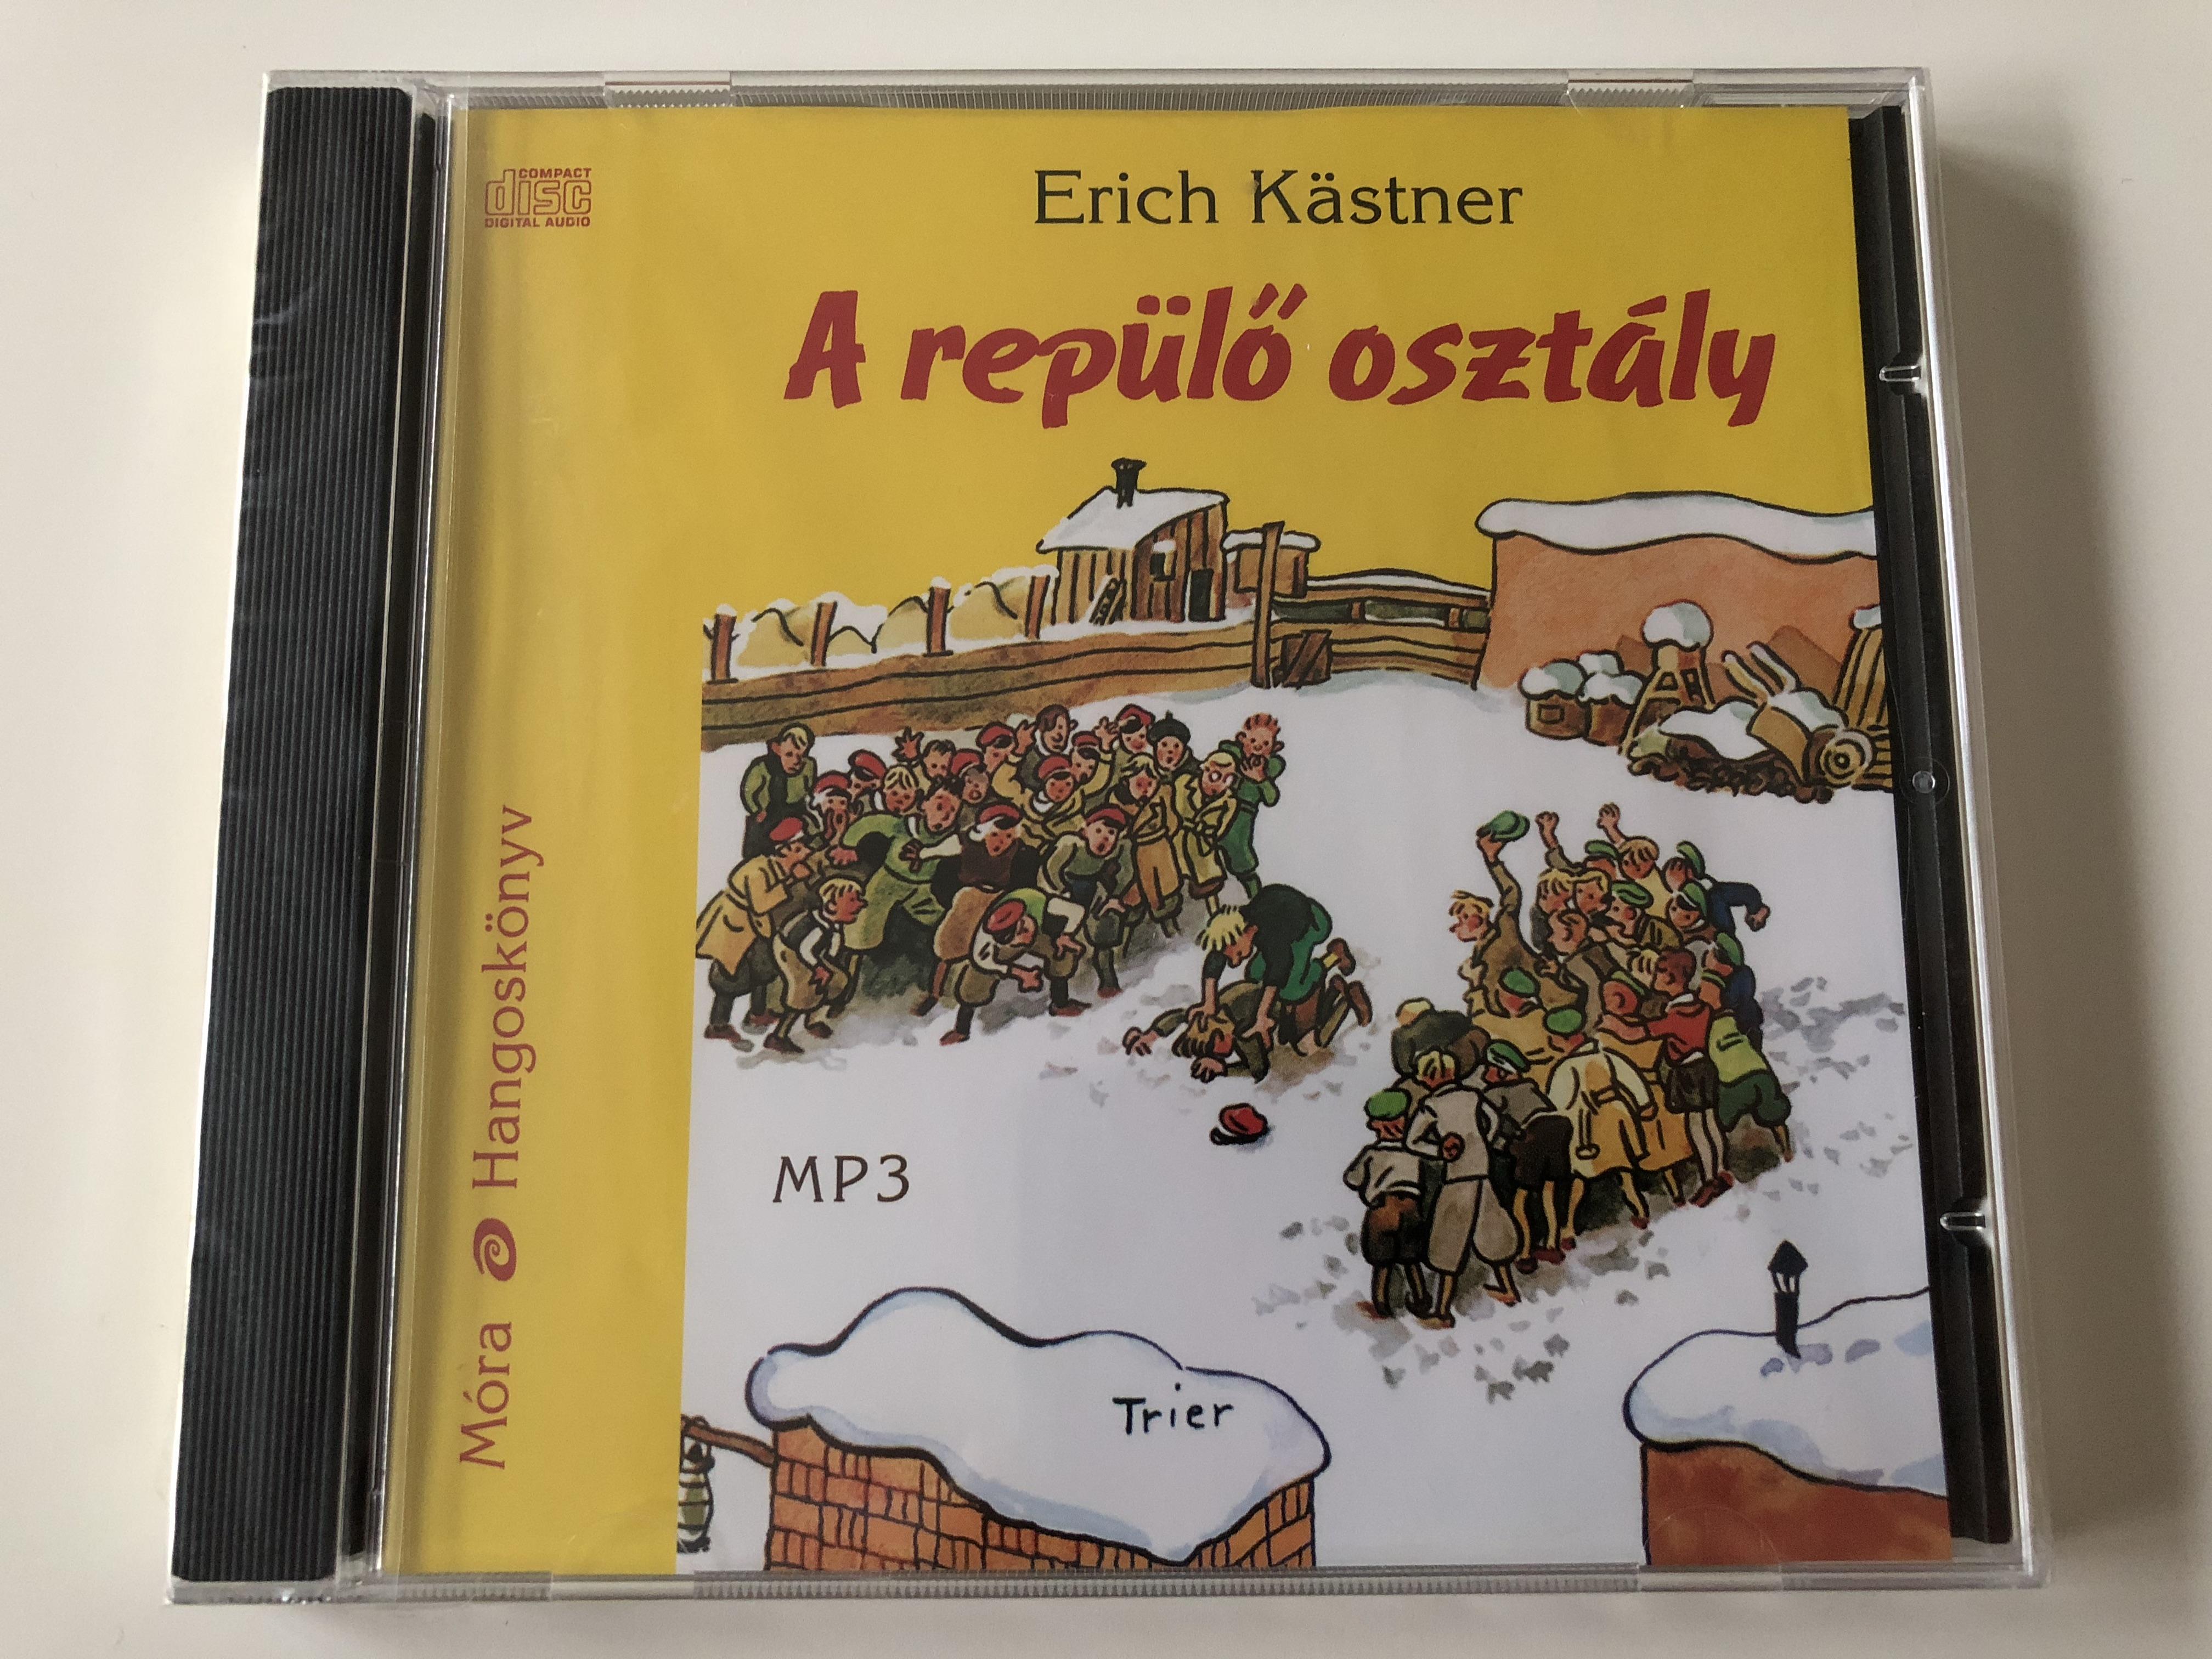 a-rep-l-oszt-ly-by-erich-k-stner-hungarian-audio-book-das-fliegende-klassenzimmer-the-flying-classroom-read-by-fesztbaum-b-la-translation-b.-rad-lili-m-ra-hangosk-nyv-mp3-cd-2010-2-.jpg